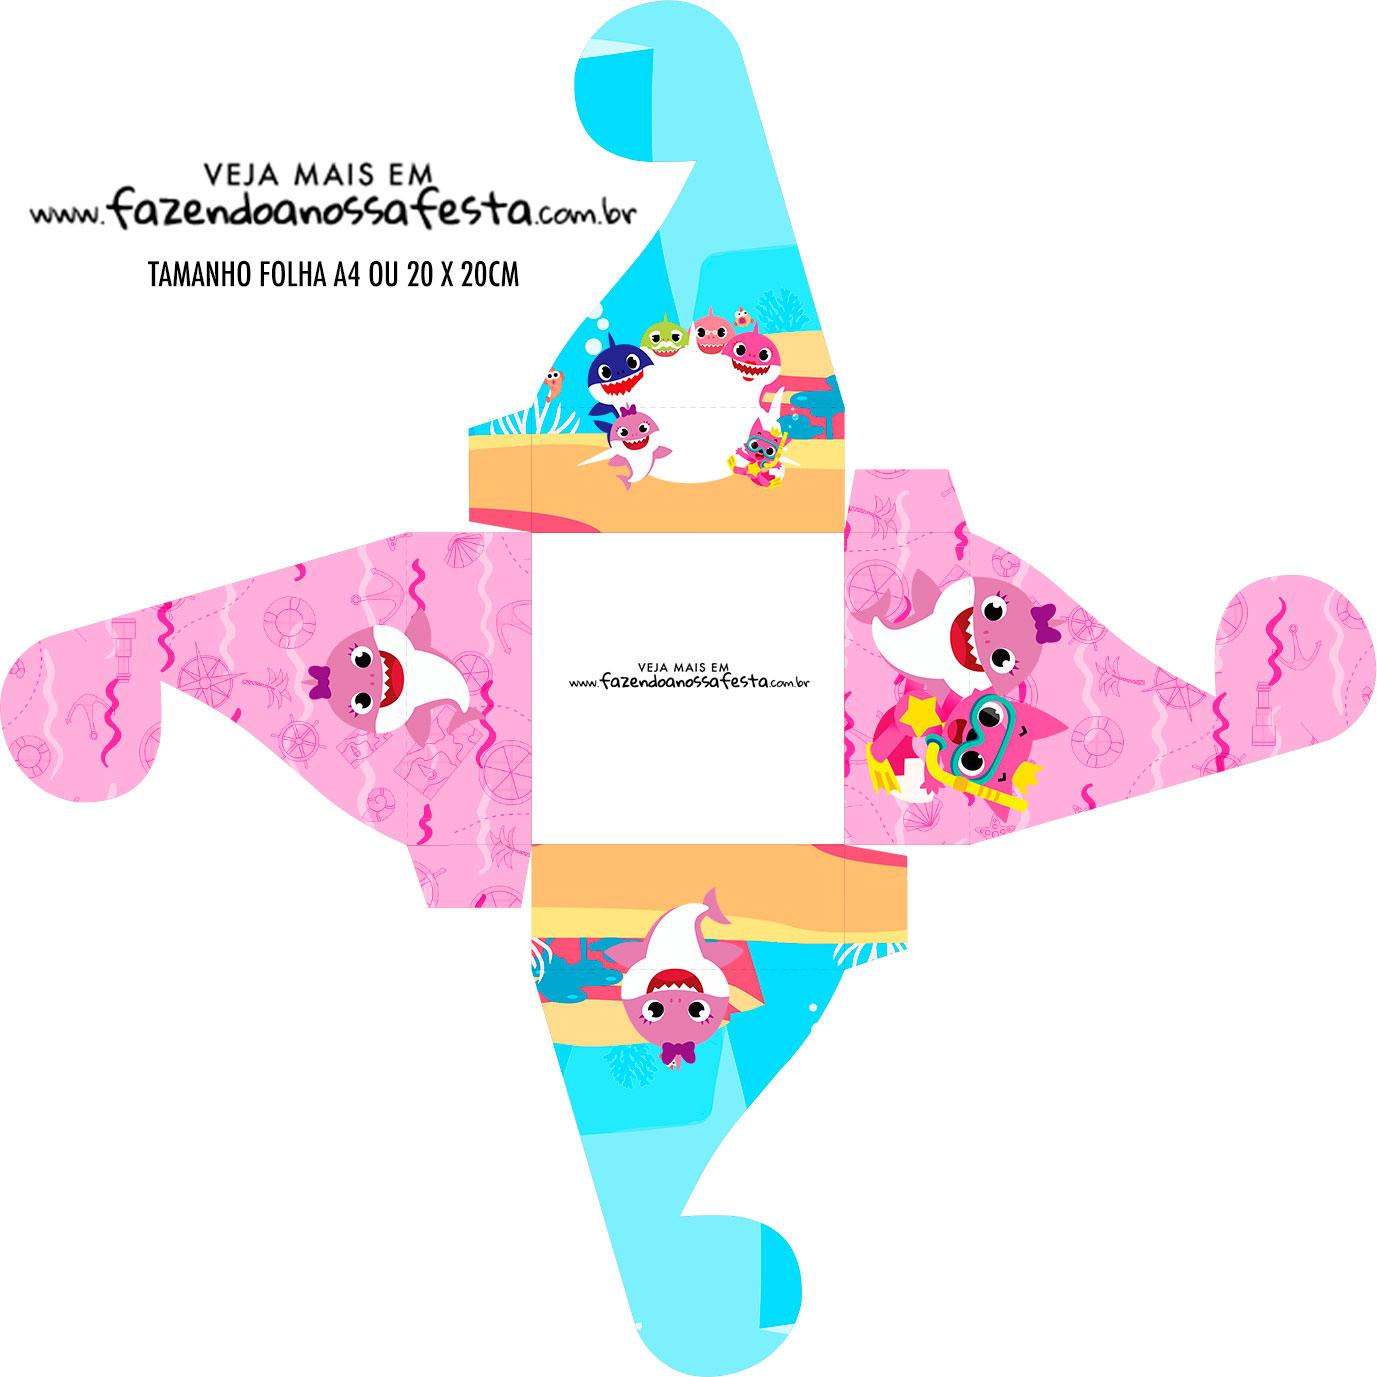 Caixa bombom personalizada Festa Baby Shark Rosa